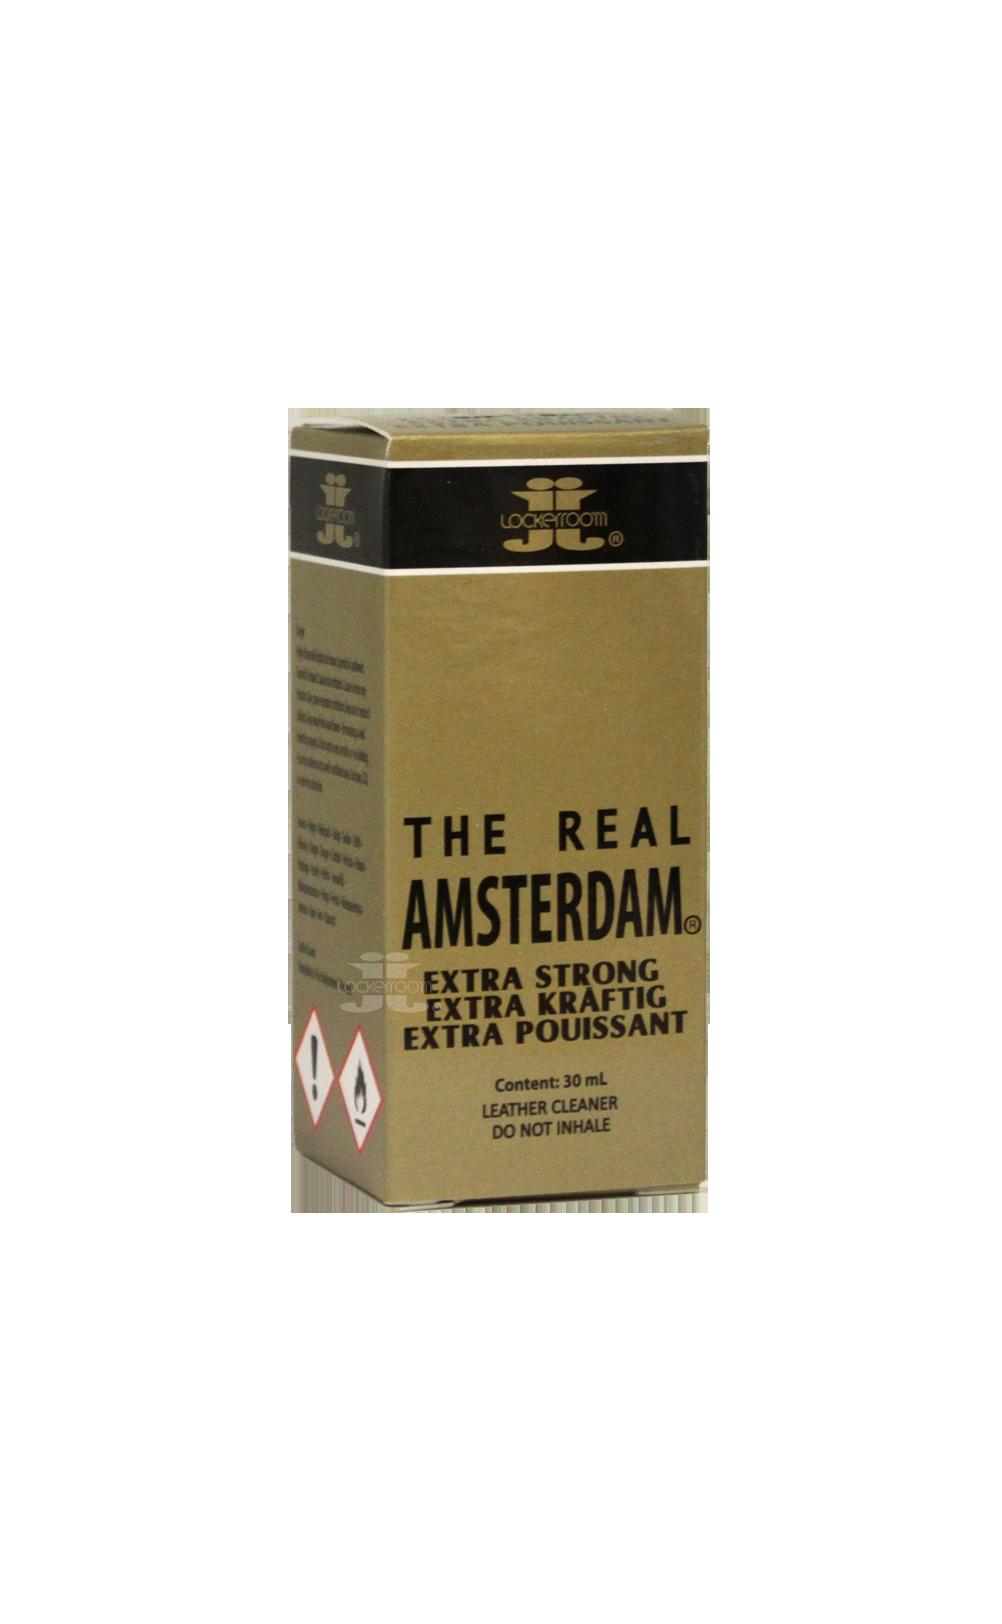 Real Amsterdam 30mL Box